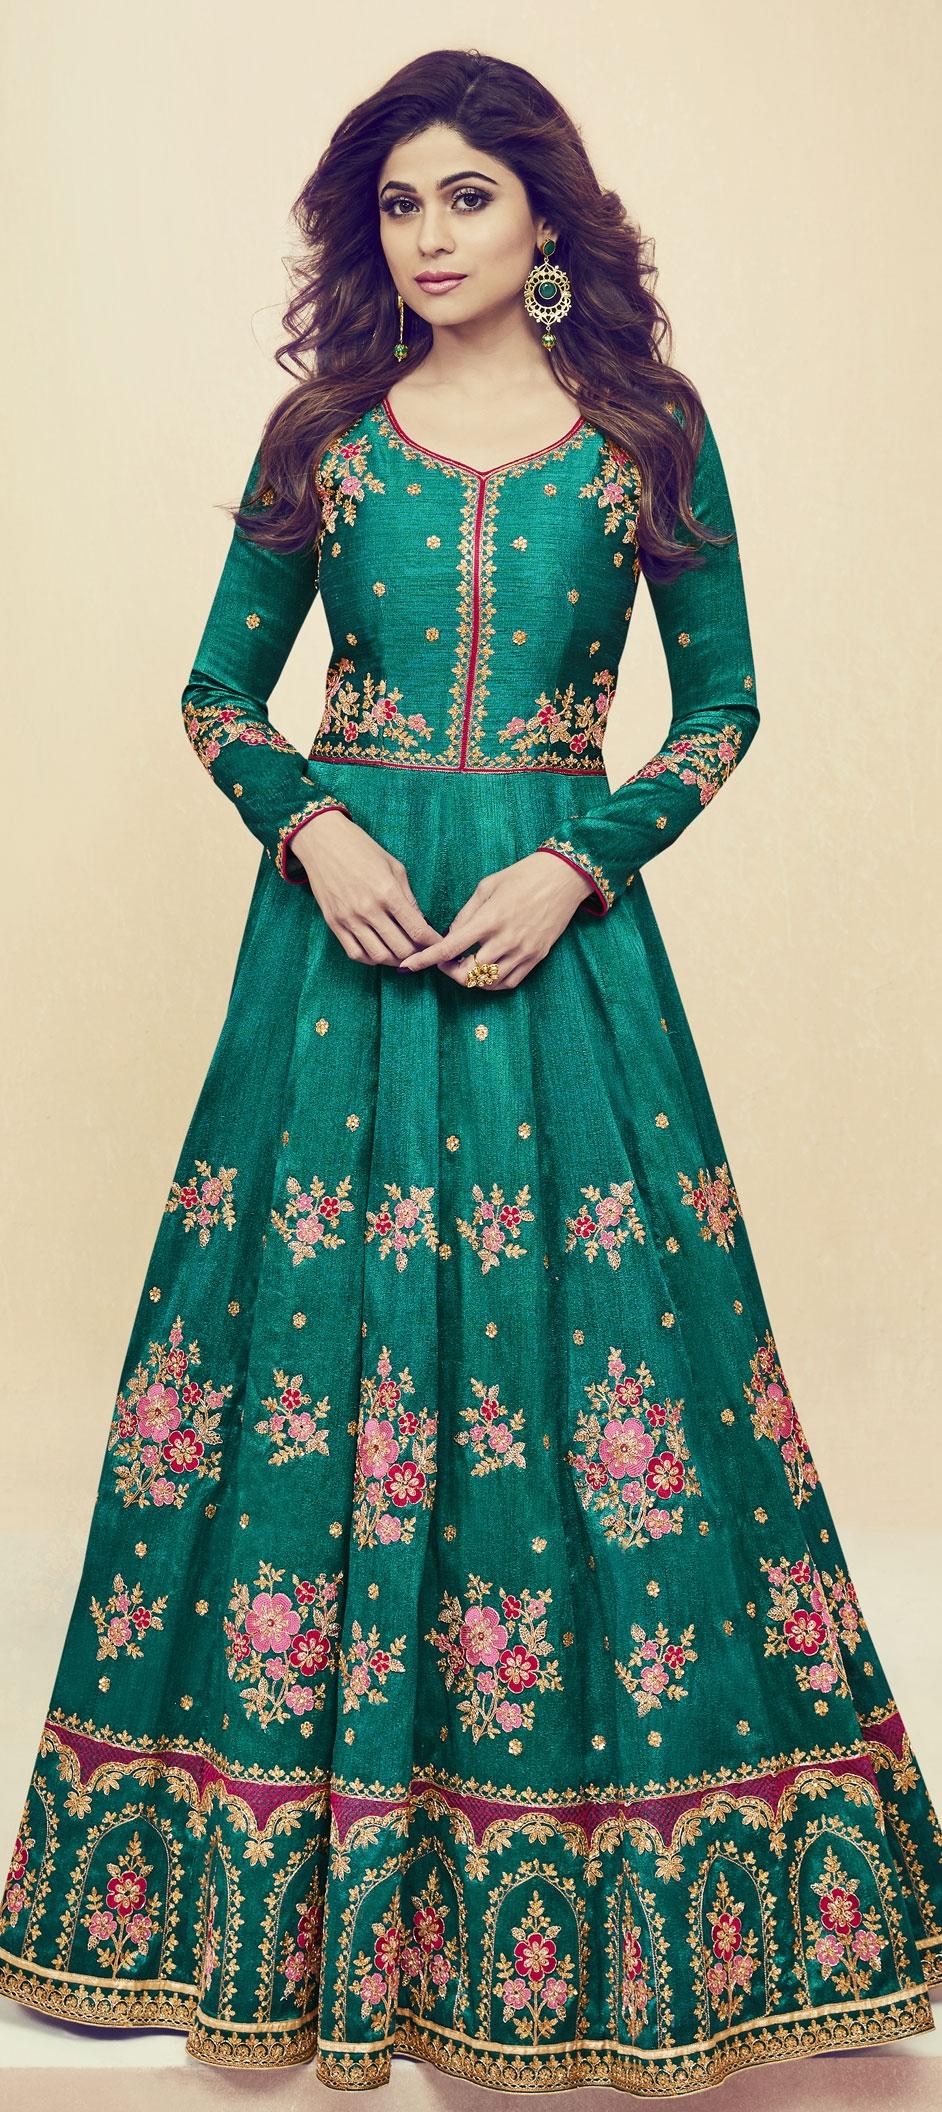 1510762: Wedding Green color Silk fabric Salwar Kameez